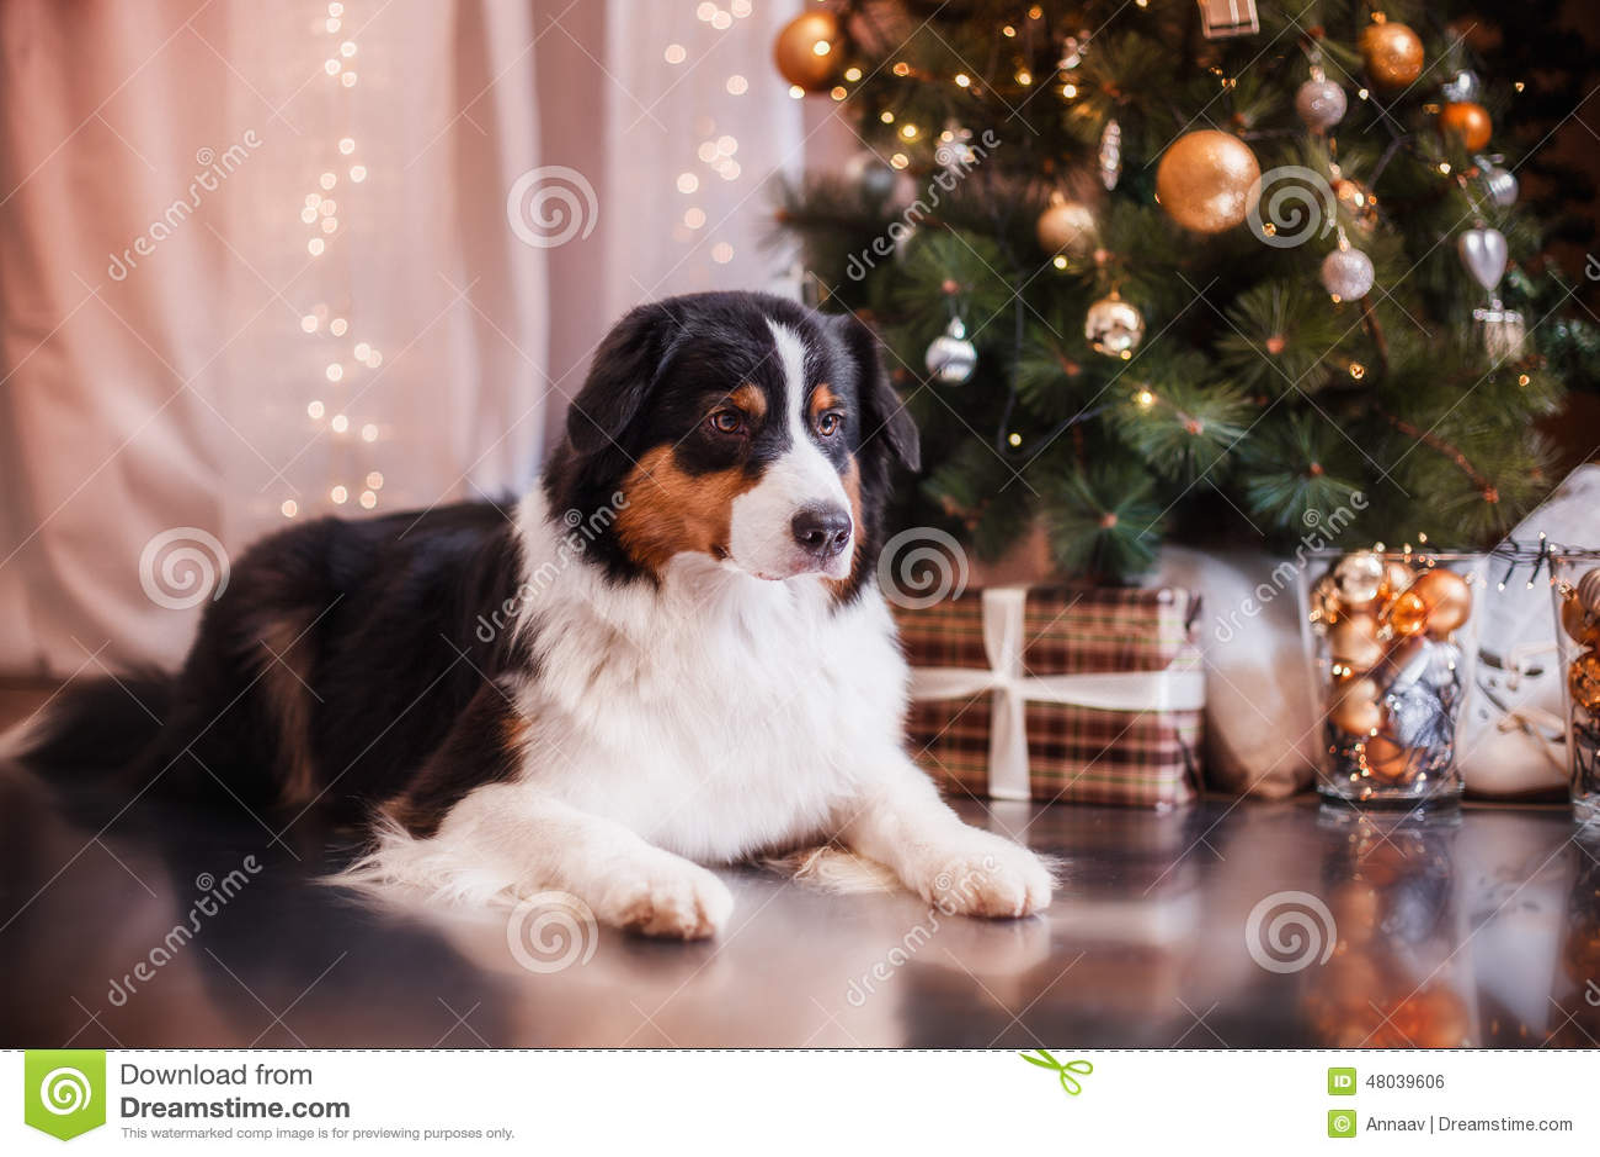 Dog Breed Australian Shepherd, Aussie, Christmas And New ...